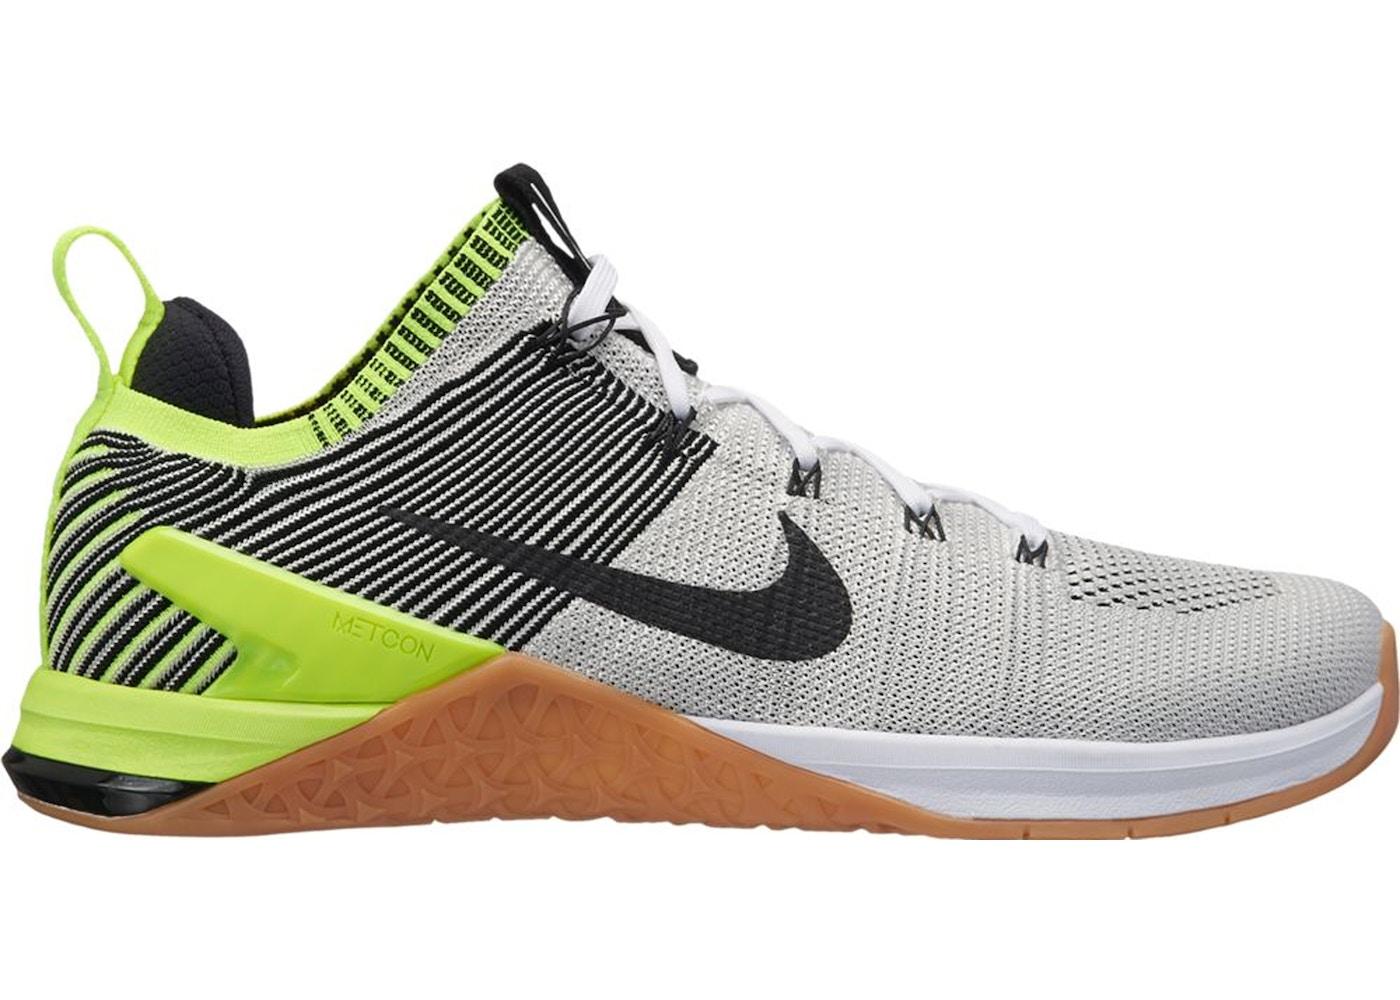 91927c150d0 Nike Metcon DSX Flyknit 2 White Black Volt Gum